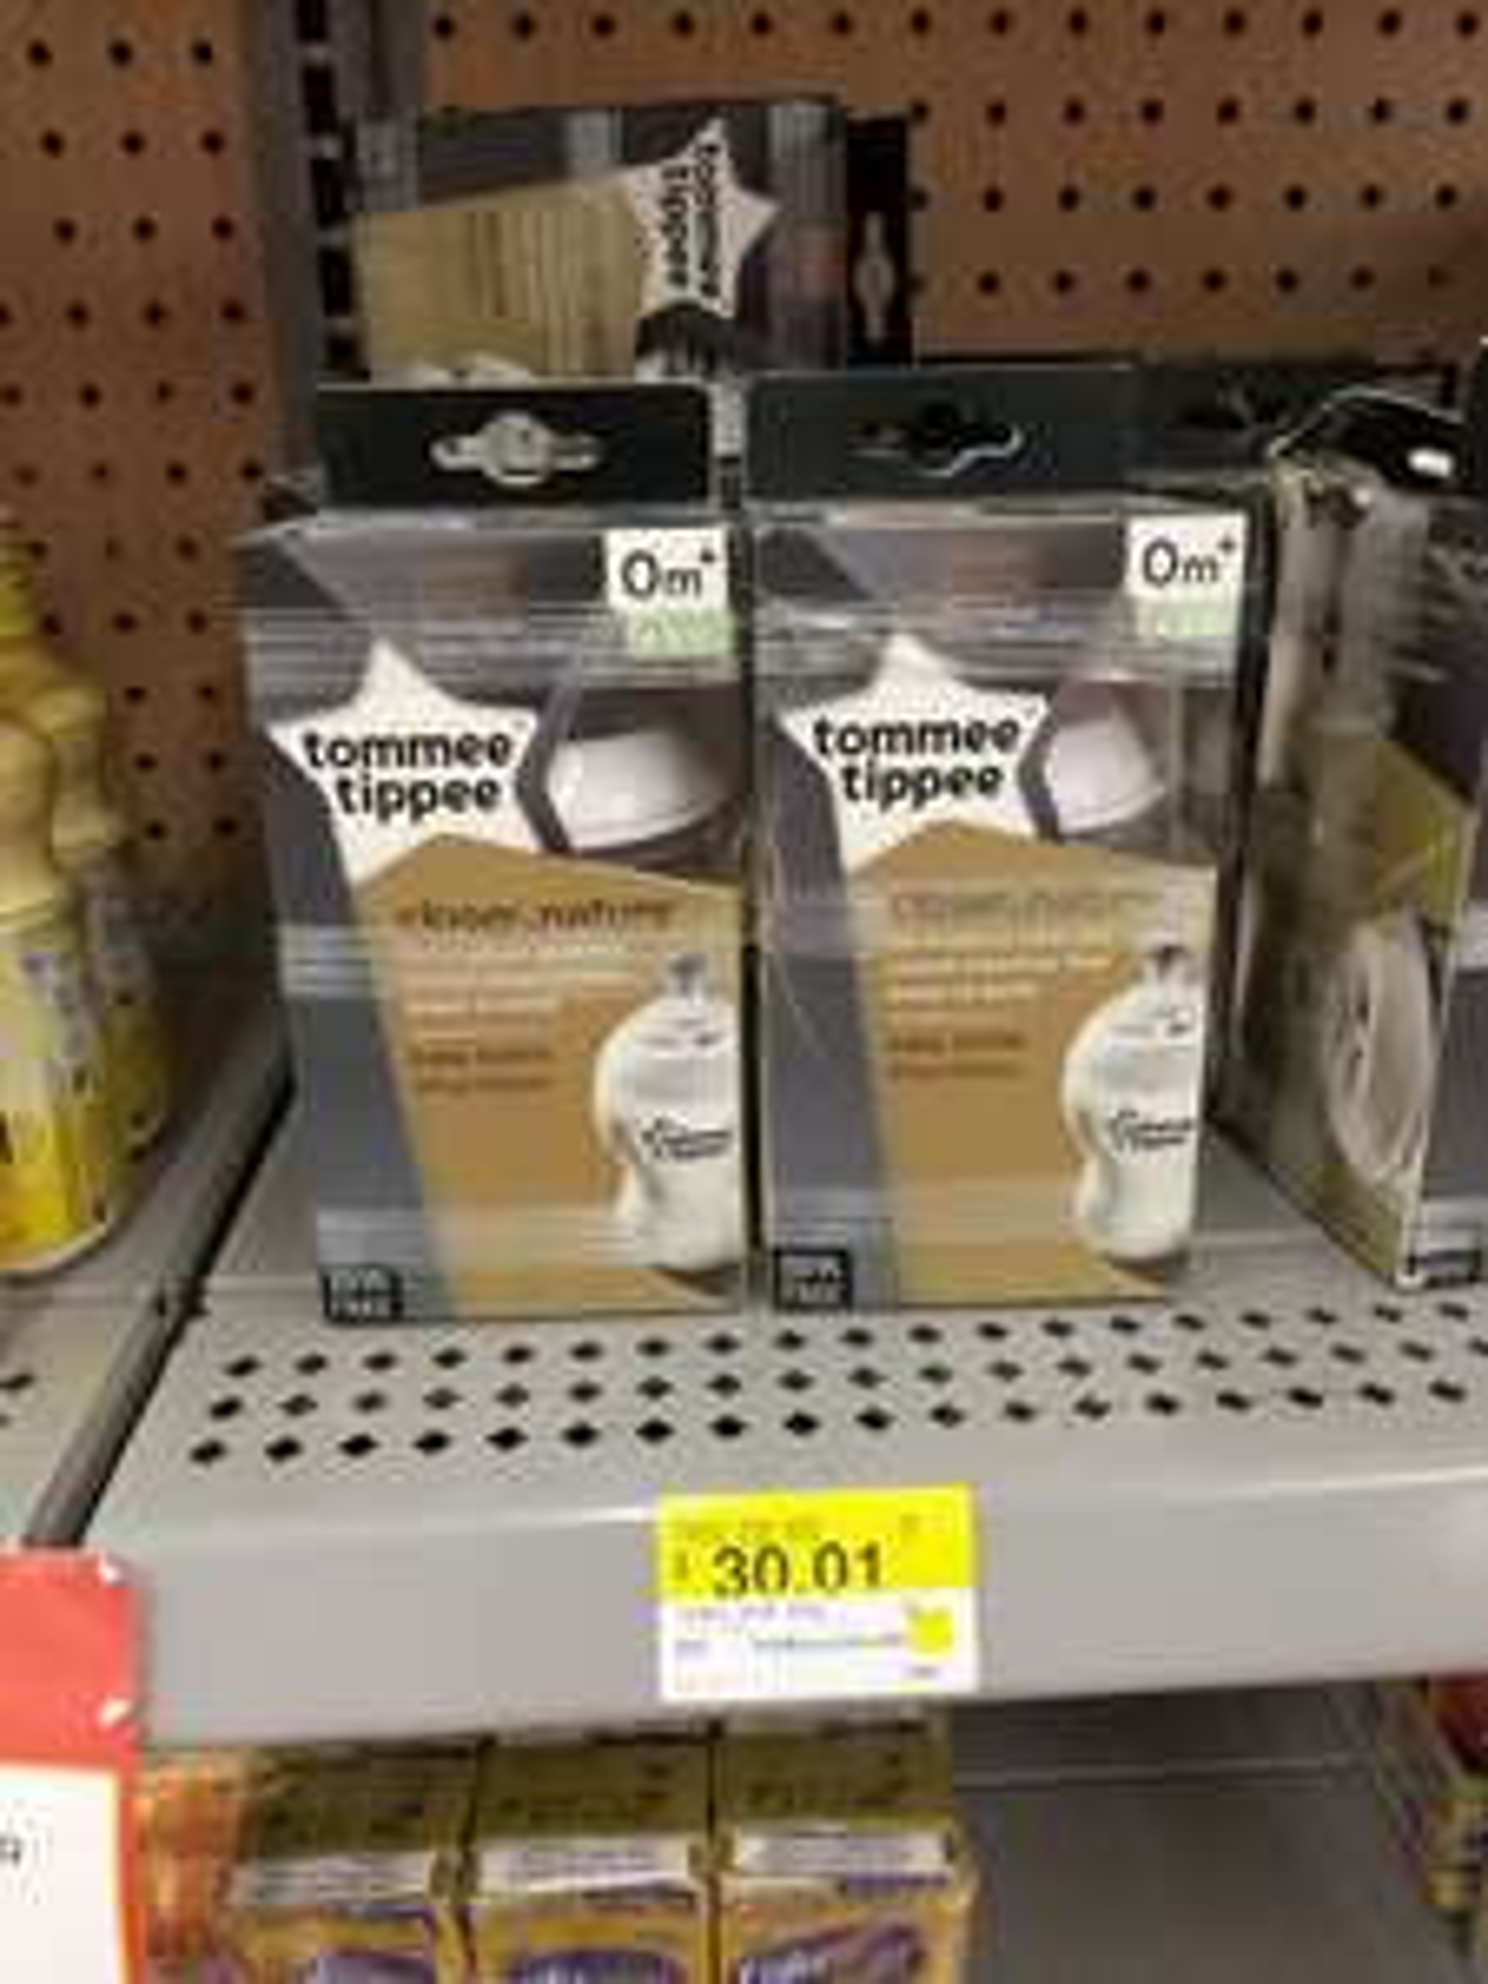 Walmart Cd Carmen: Biberón  tommee  teppee 9oz a $30.01